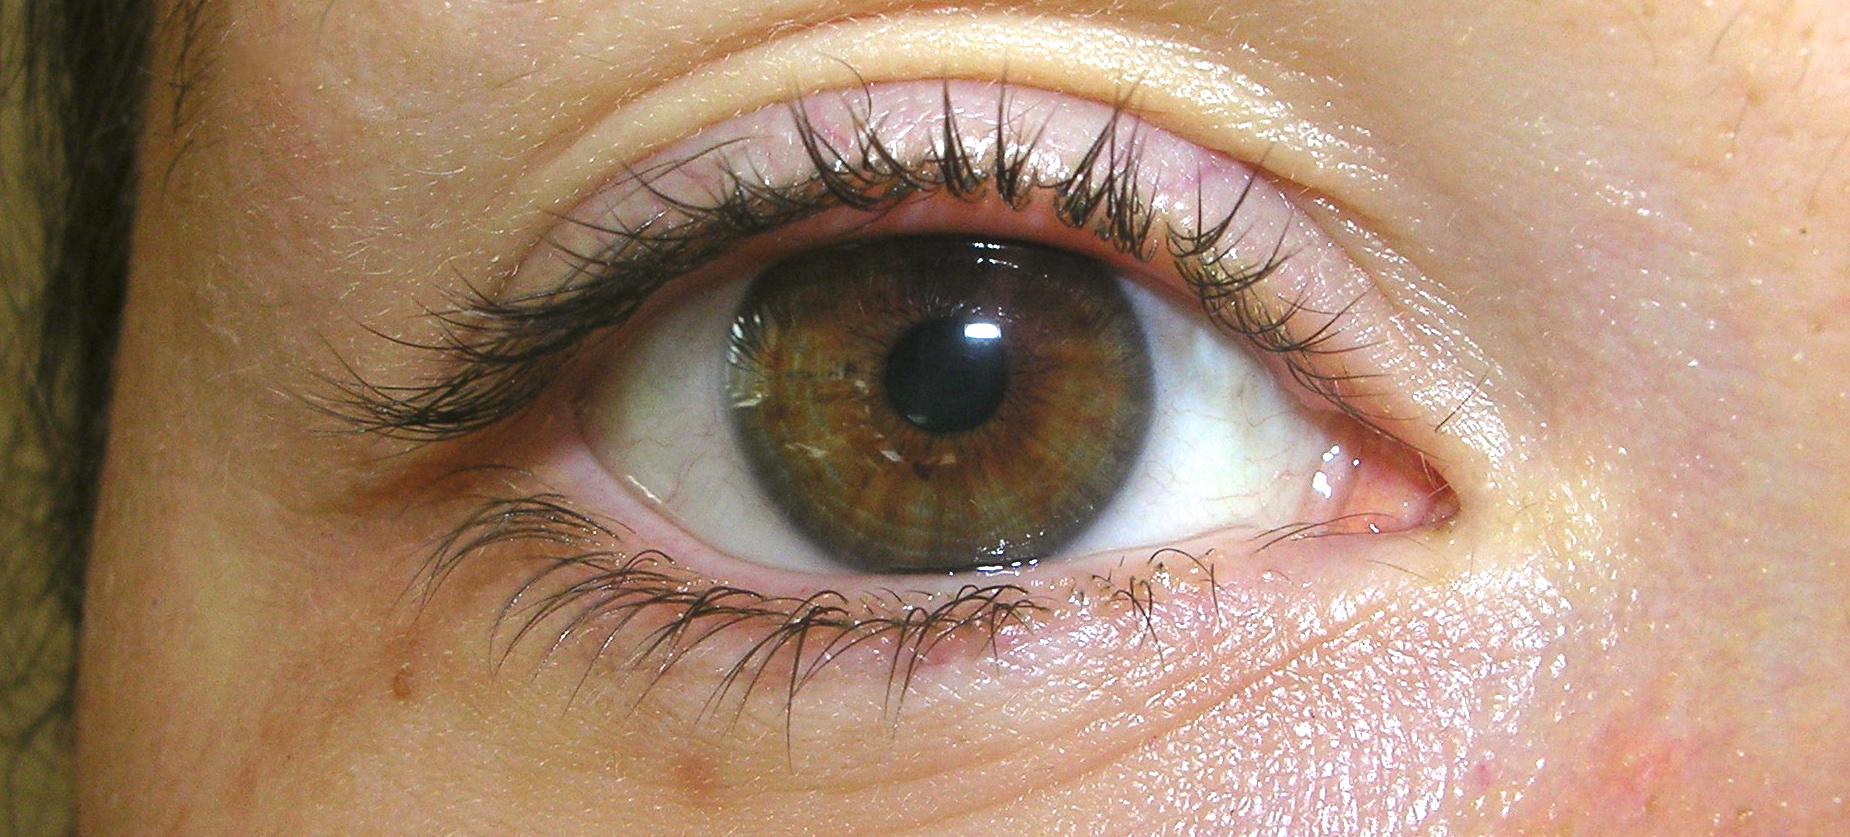 Mjälleksem ögon